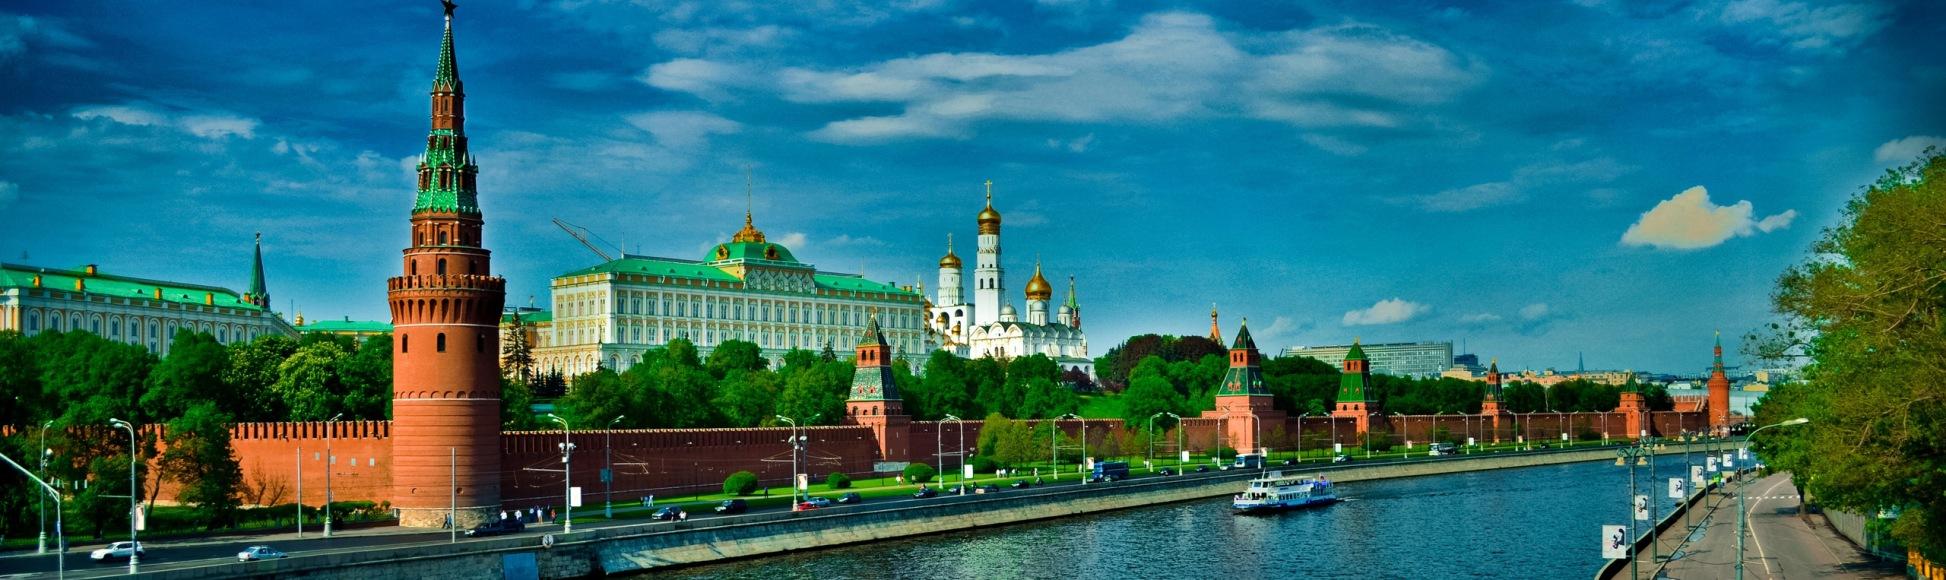 MOSKVA NOVA GODINA 2019